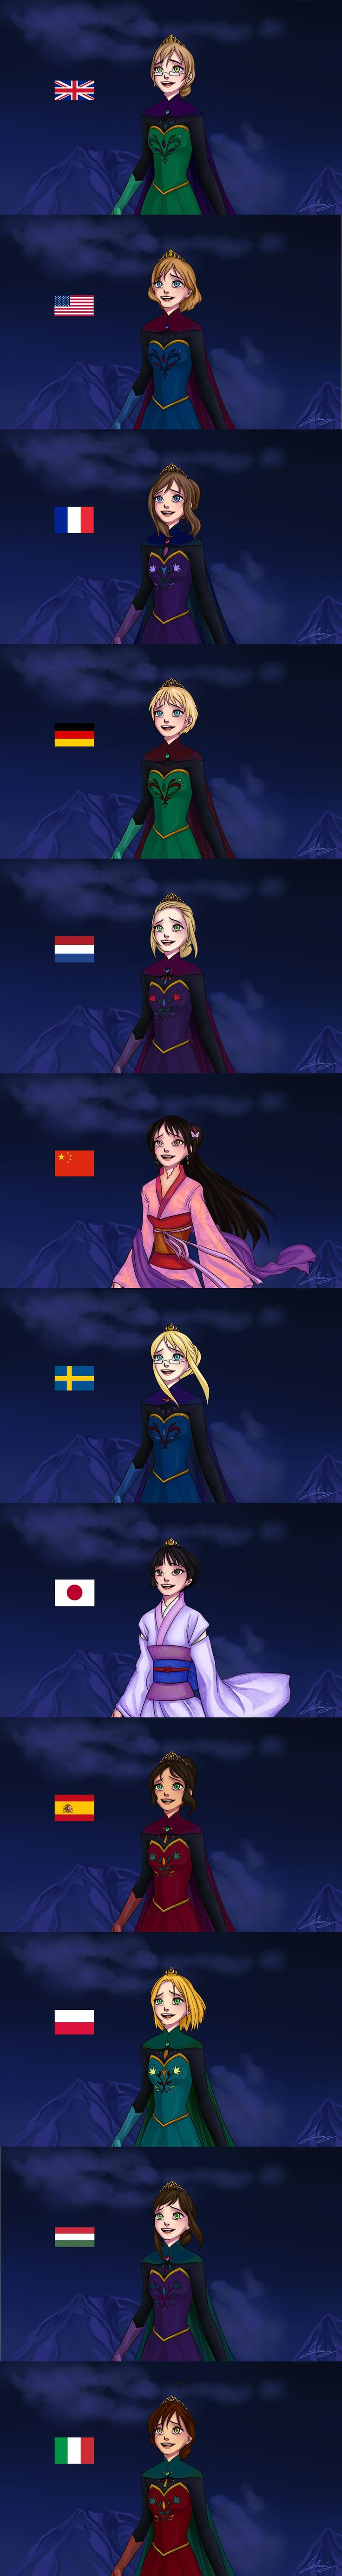 Let it Go <3 Elsa de diferentes etnias! Frozen pelo mundo! <3